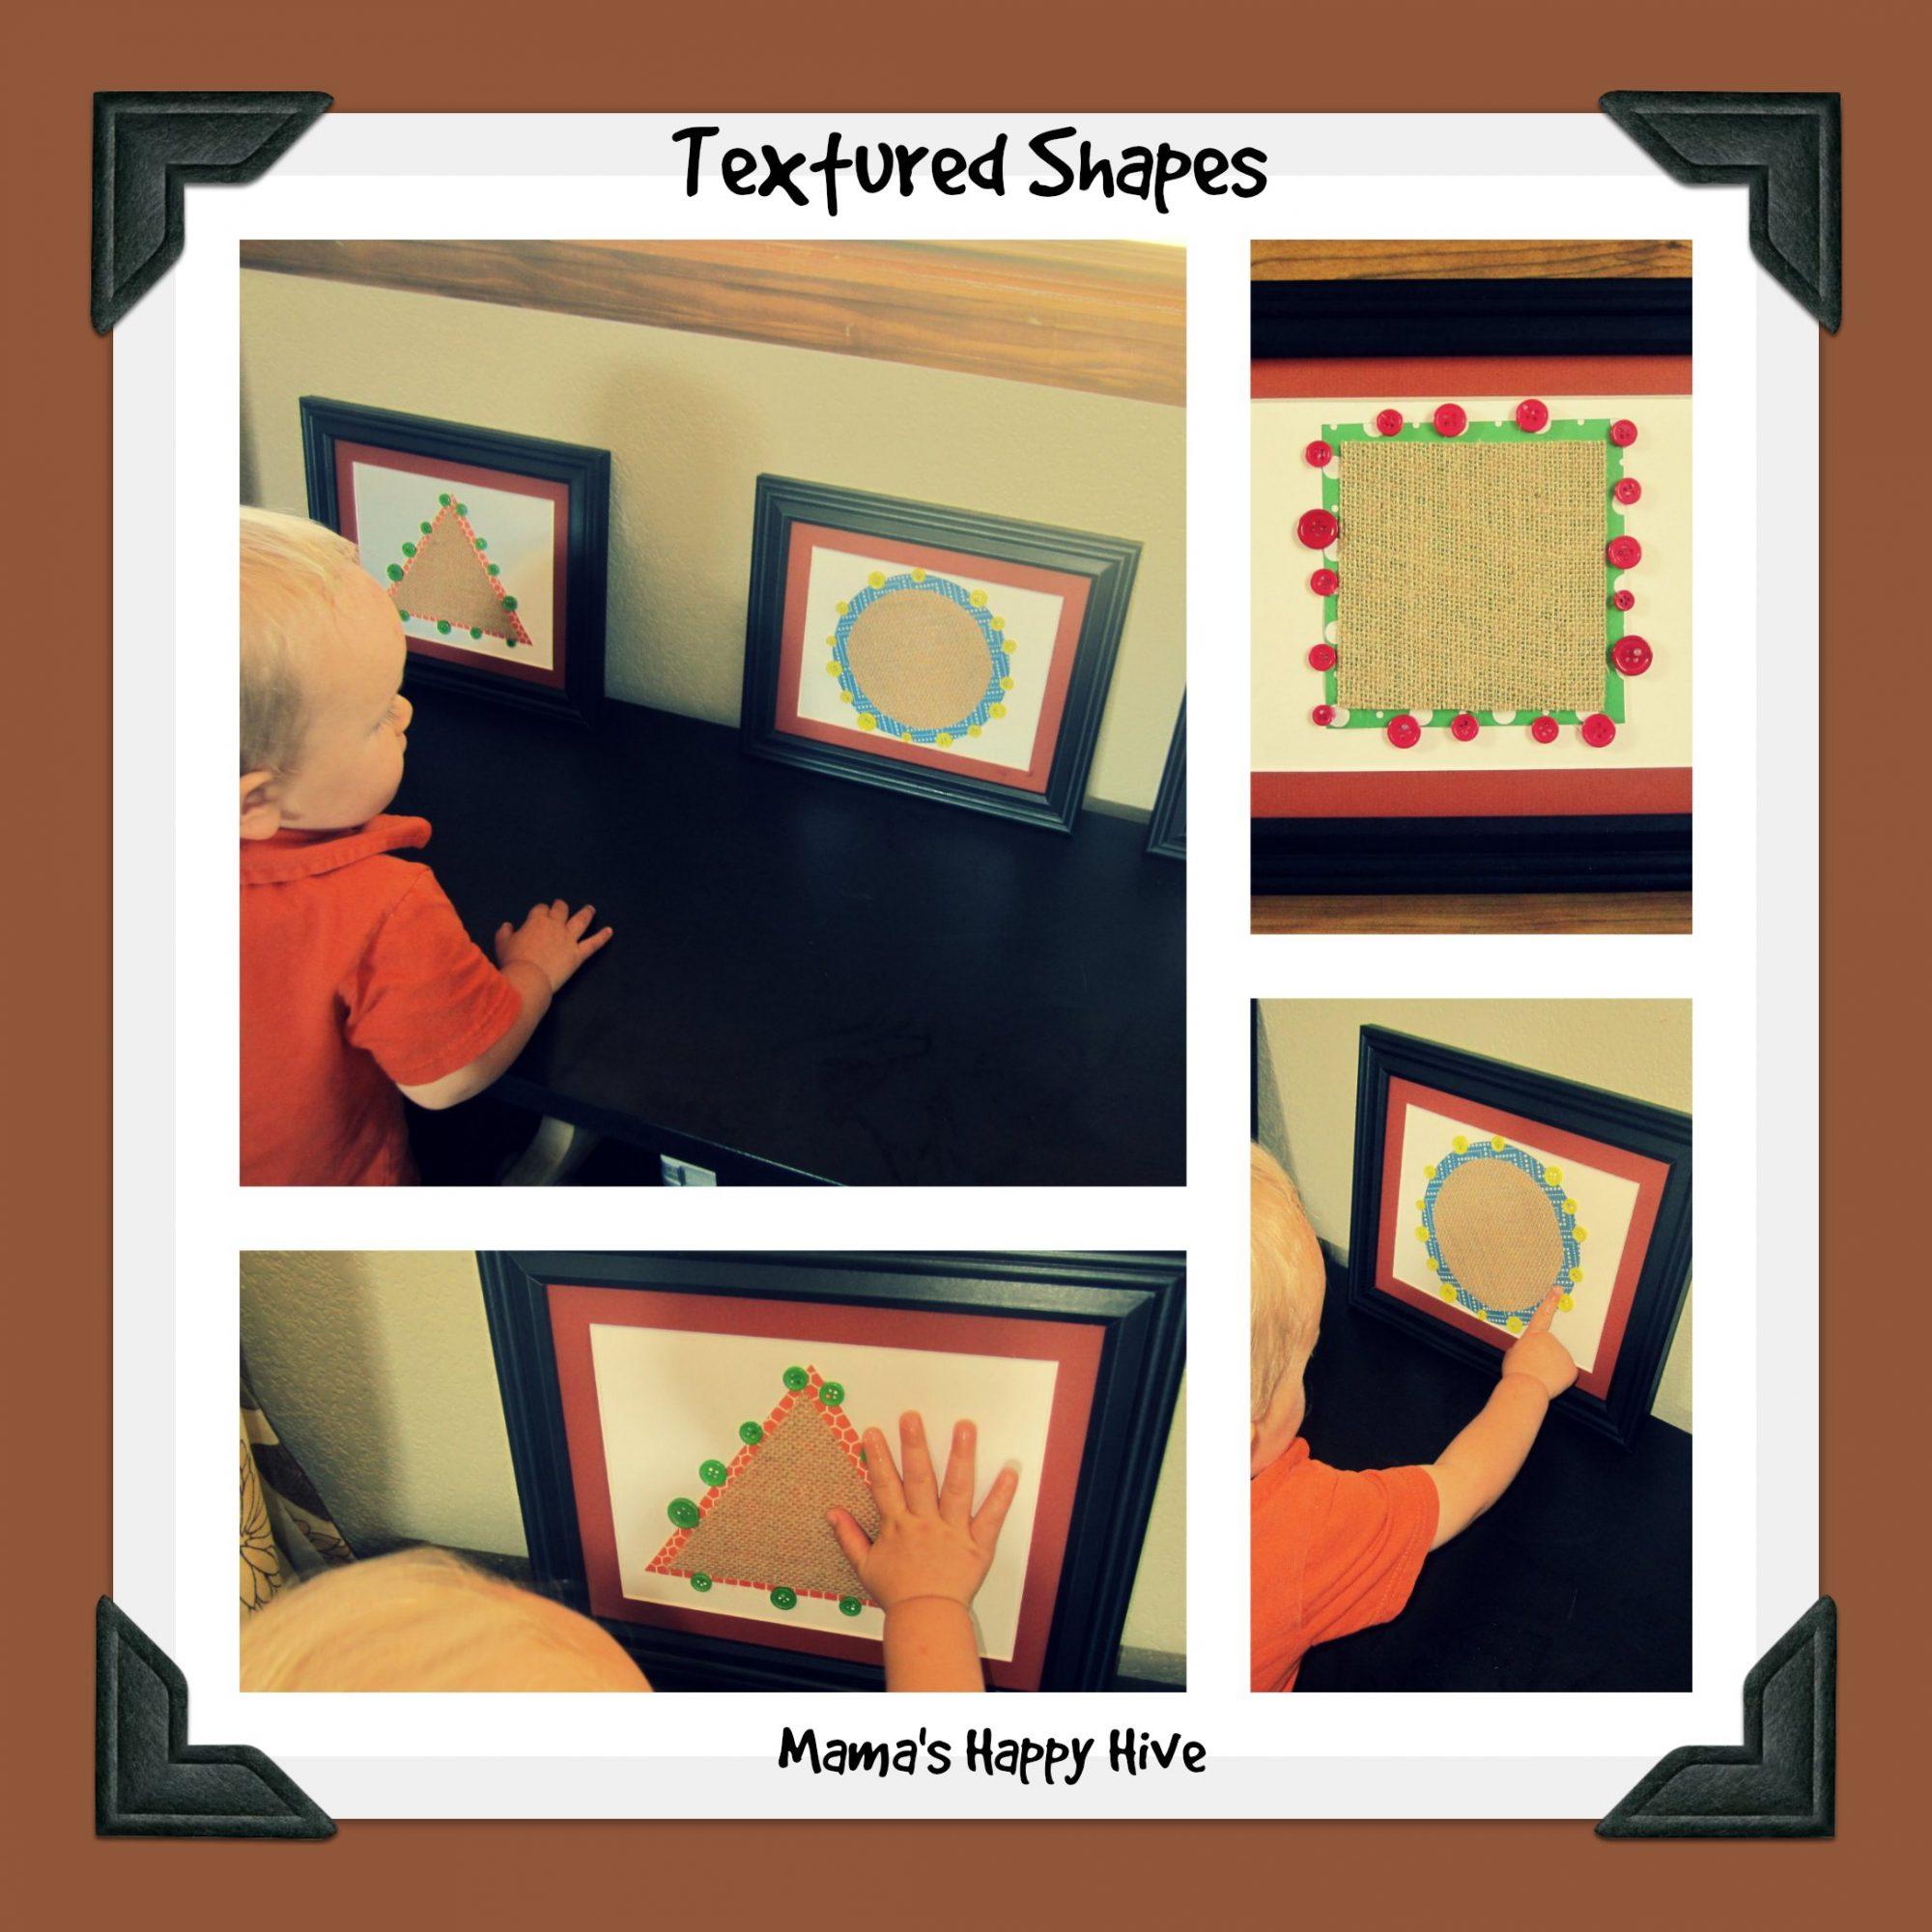 Toddler Montessori Shape Lessons - www.mamashappyhive.com